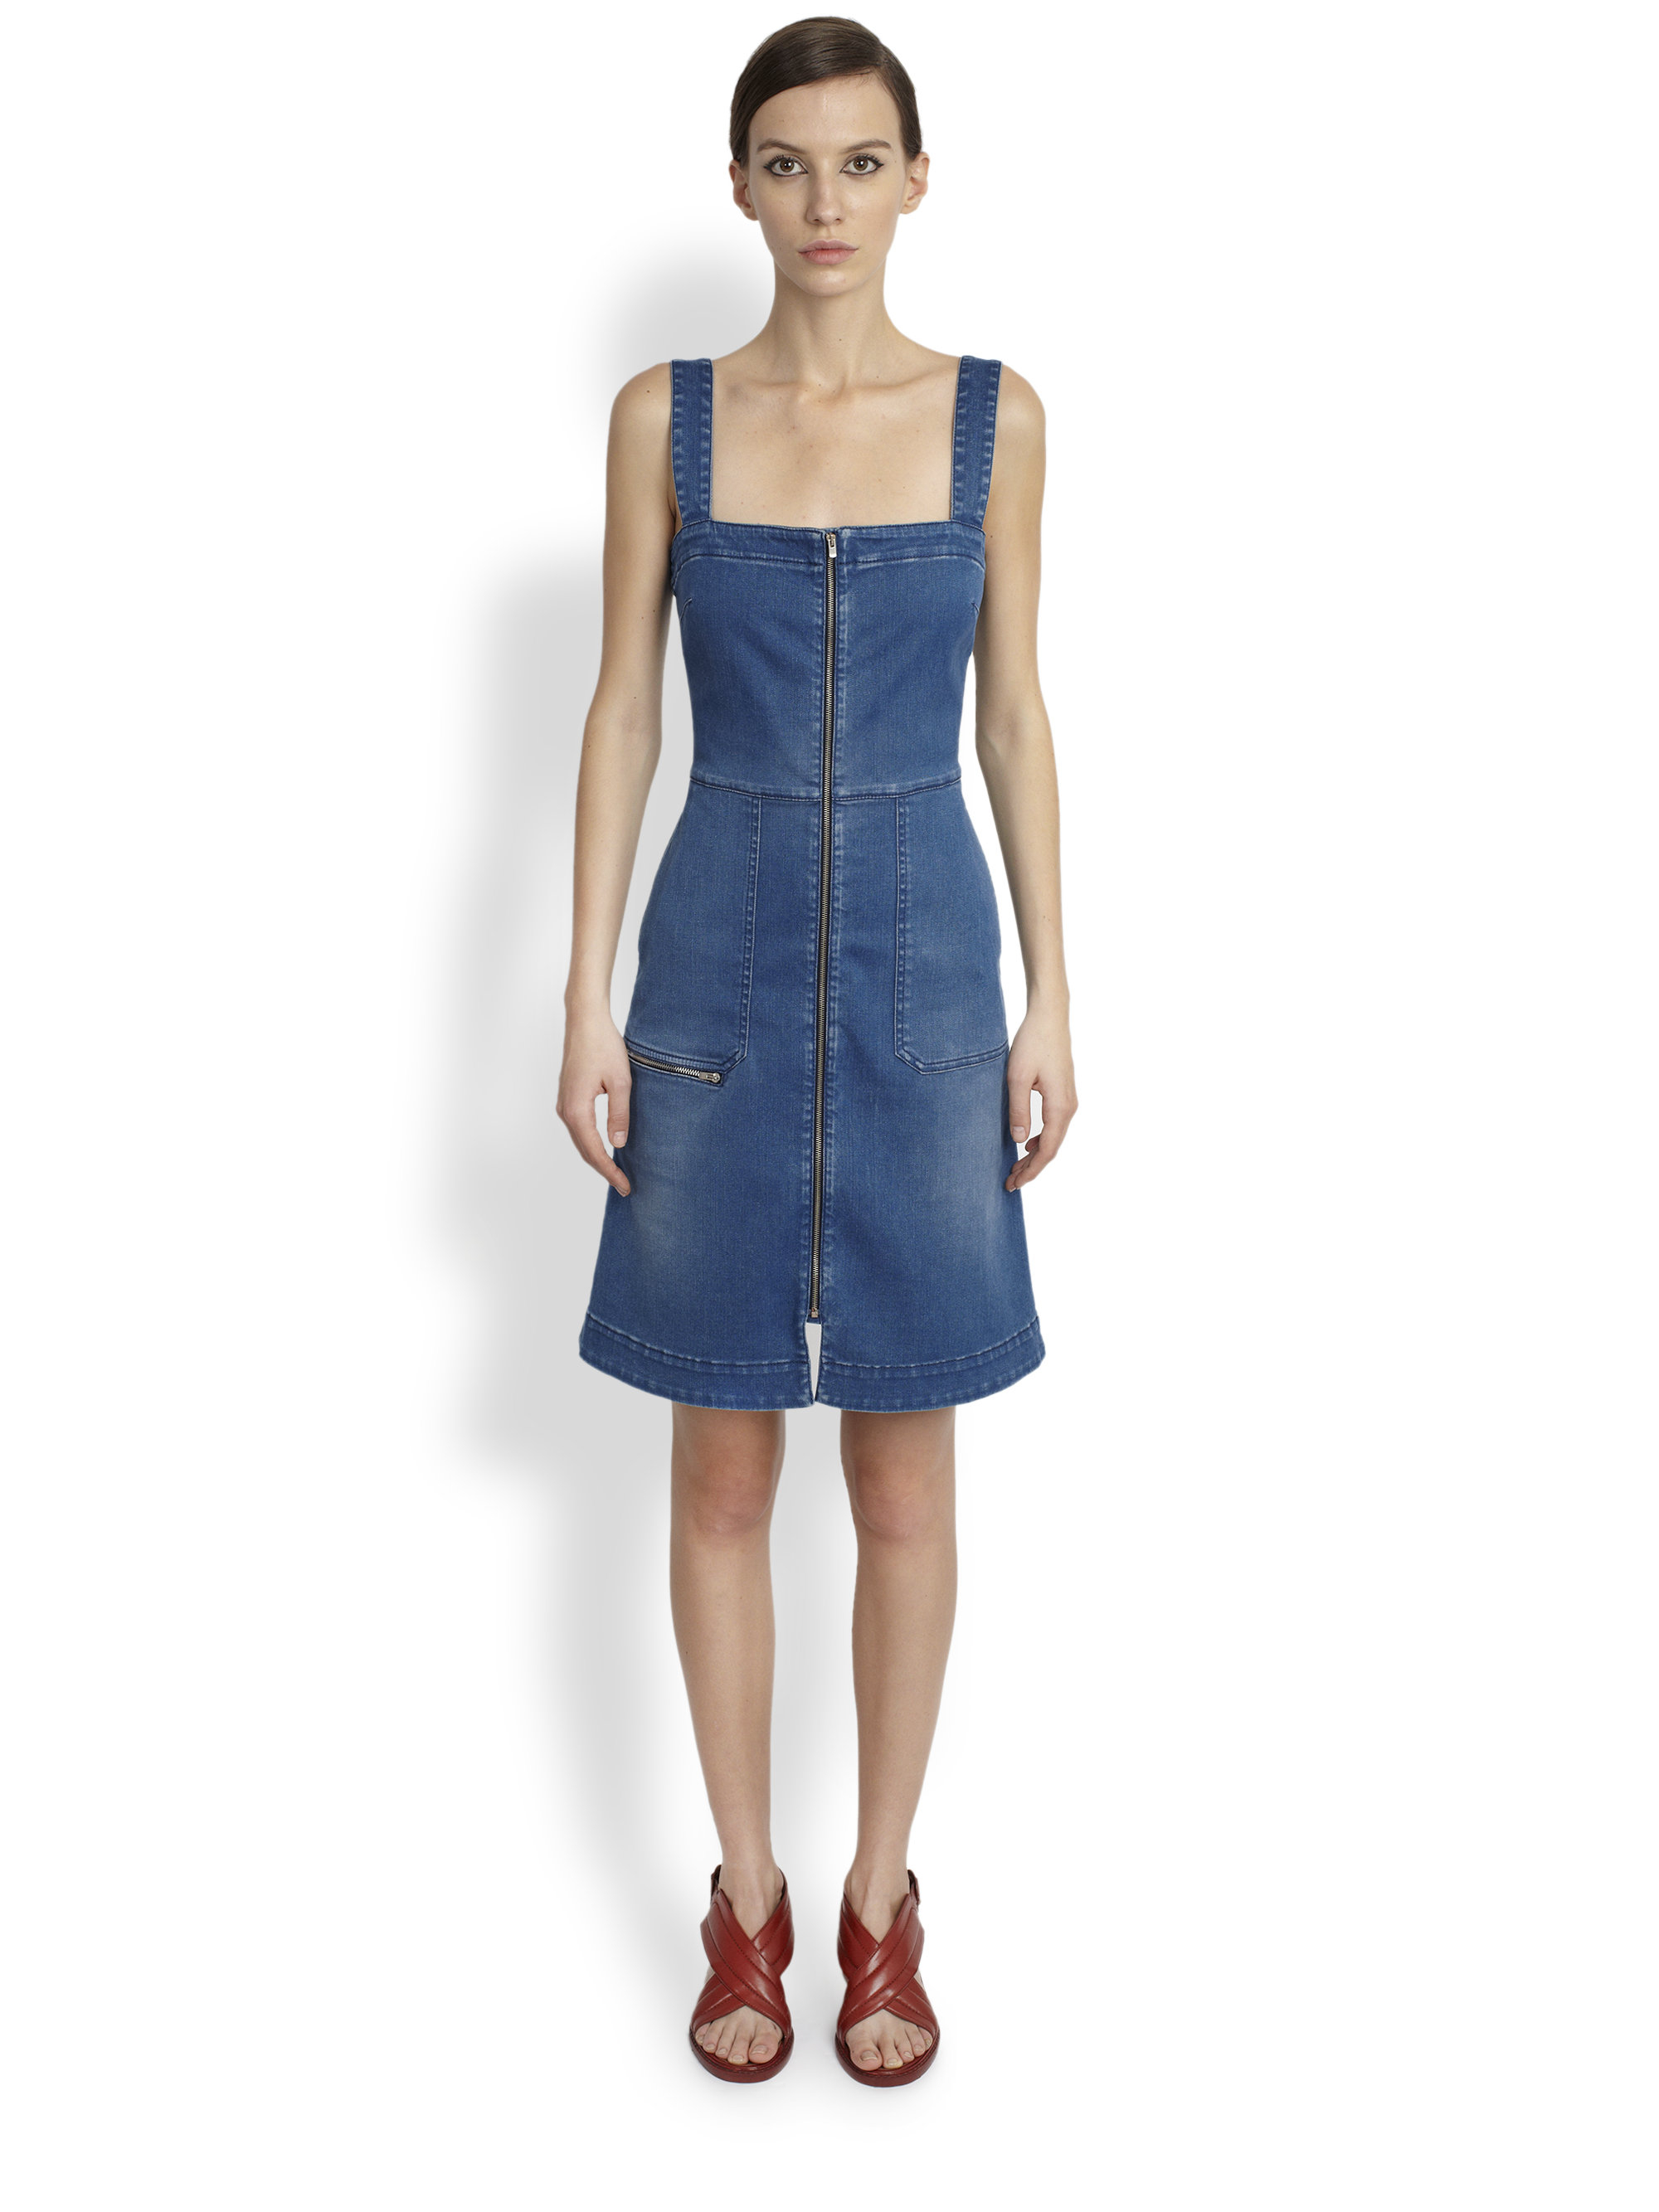 82dd36e34b Stella mccartney zip front denim dress in blue lyst jpg 2000x2667 Denim zip  front dress